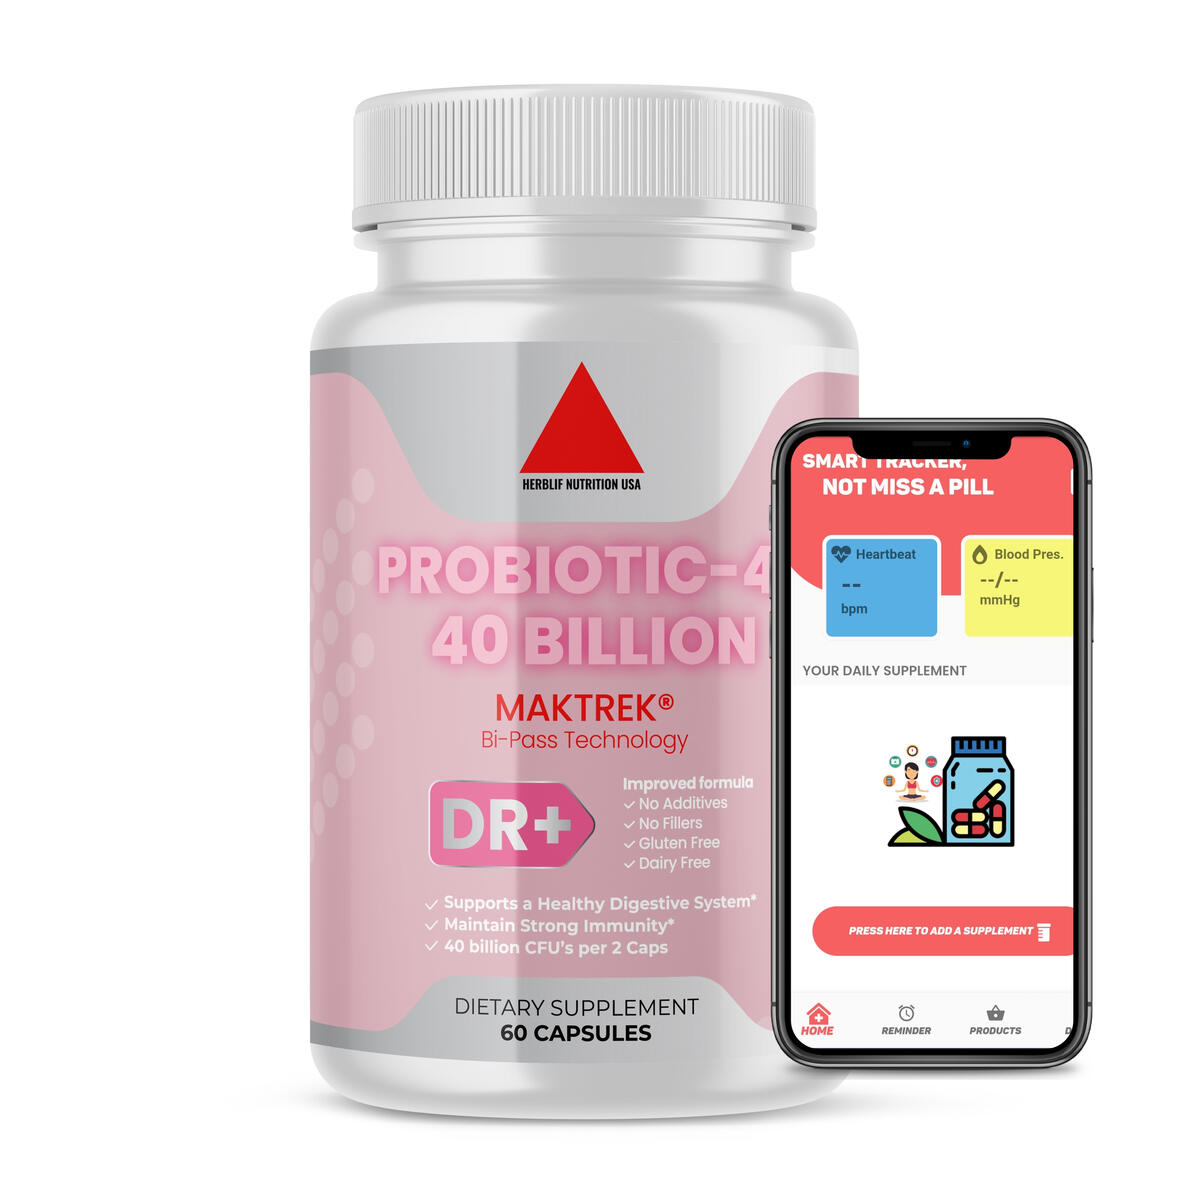 Probiotic 40 Billion CFU - Dr. Approved Probiotics for Adults with 13 Powerful Strains & Natural Prebiotics - Patented Shelf Stable Probiotics for Women - Lactobacillus Acidophilus